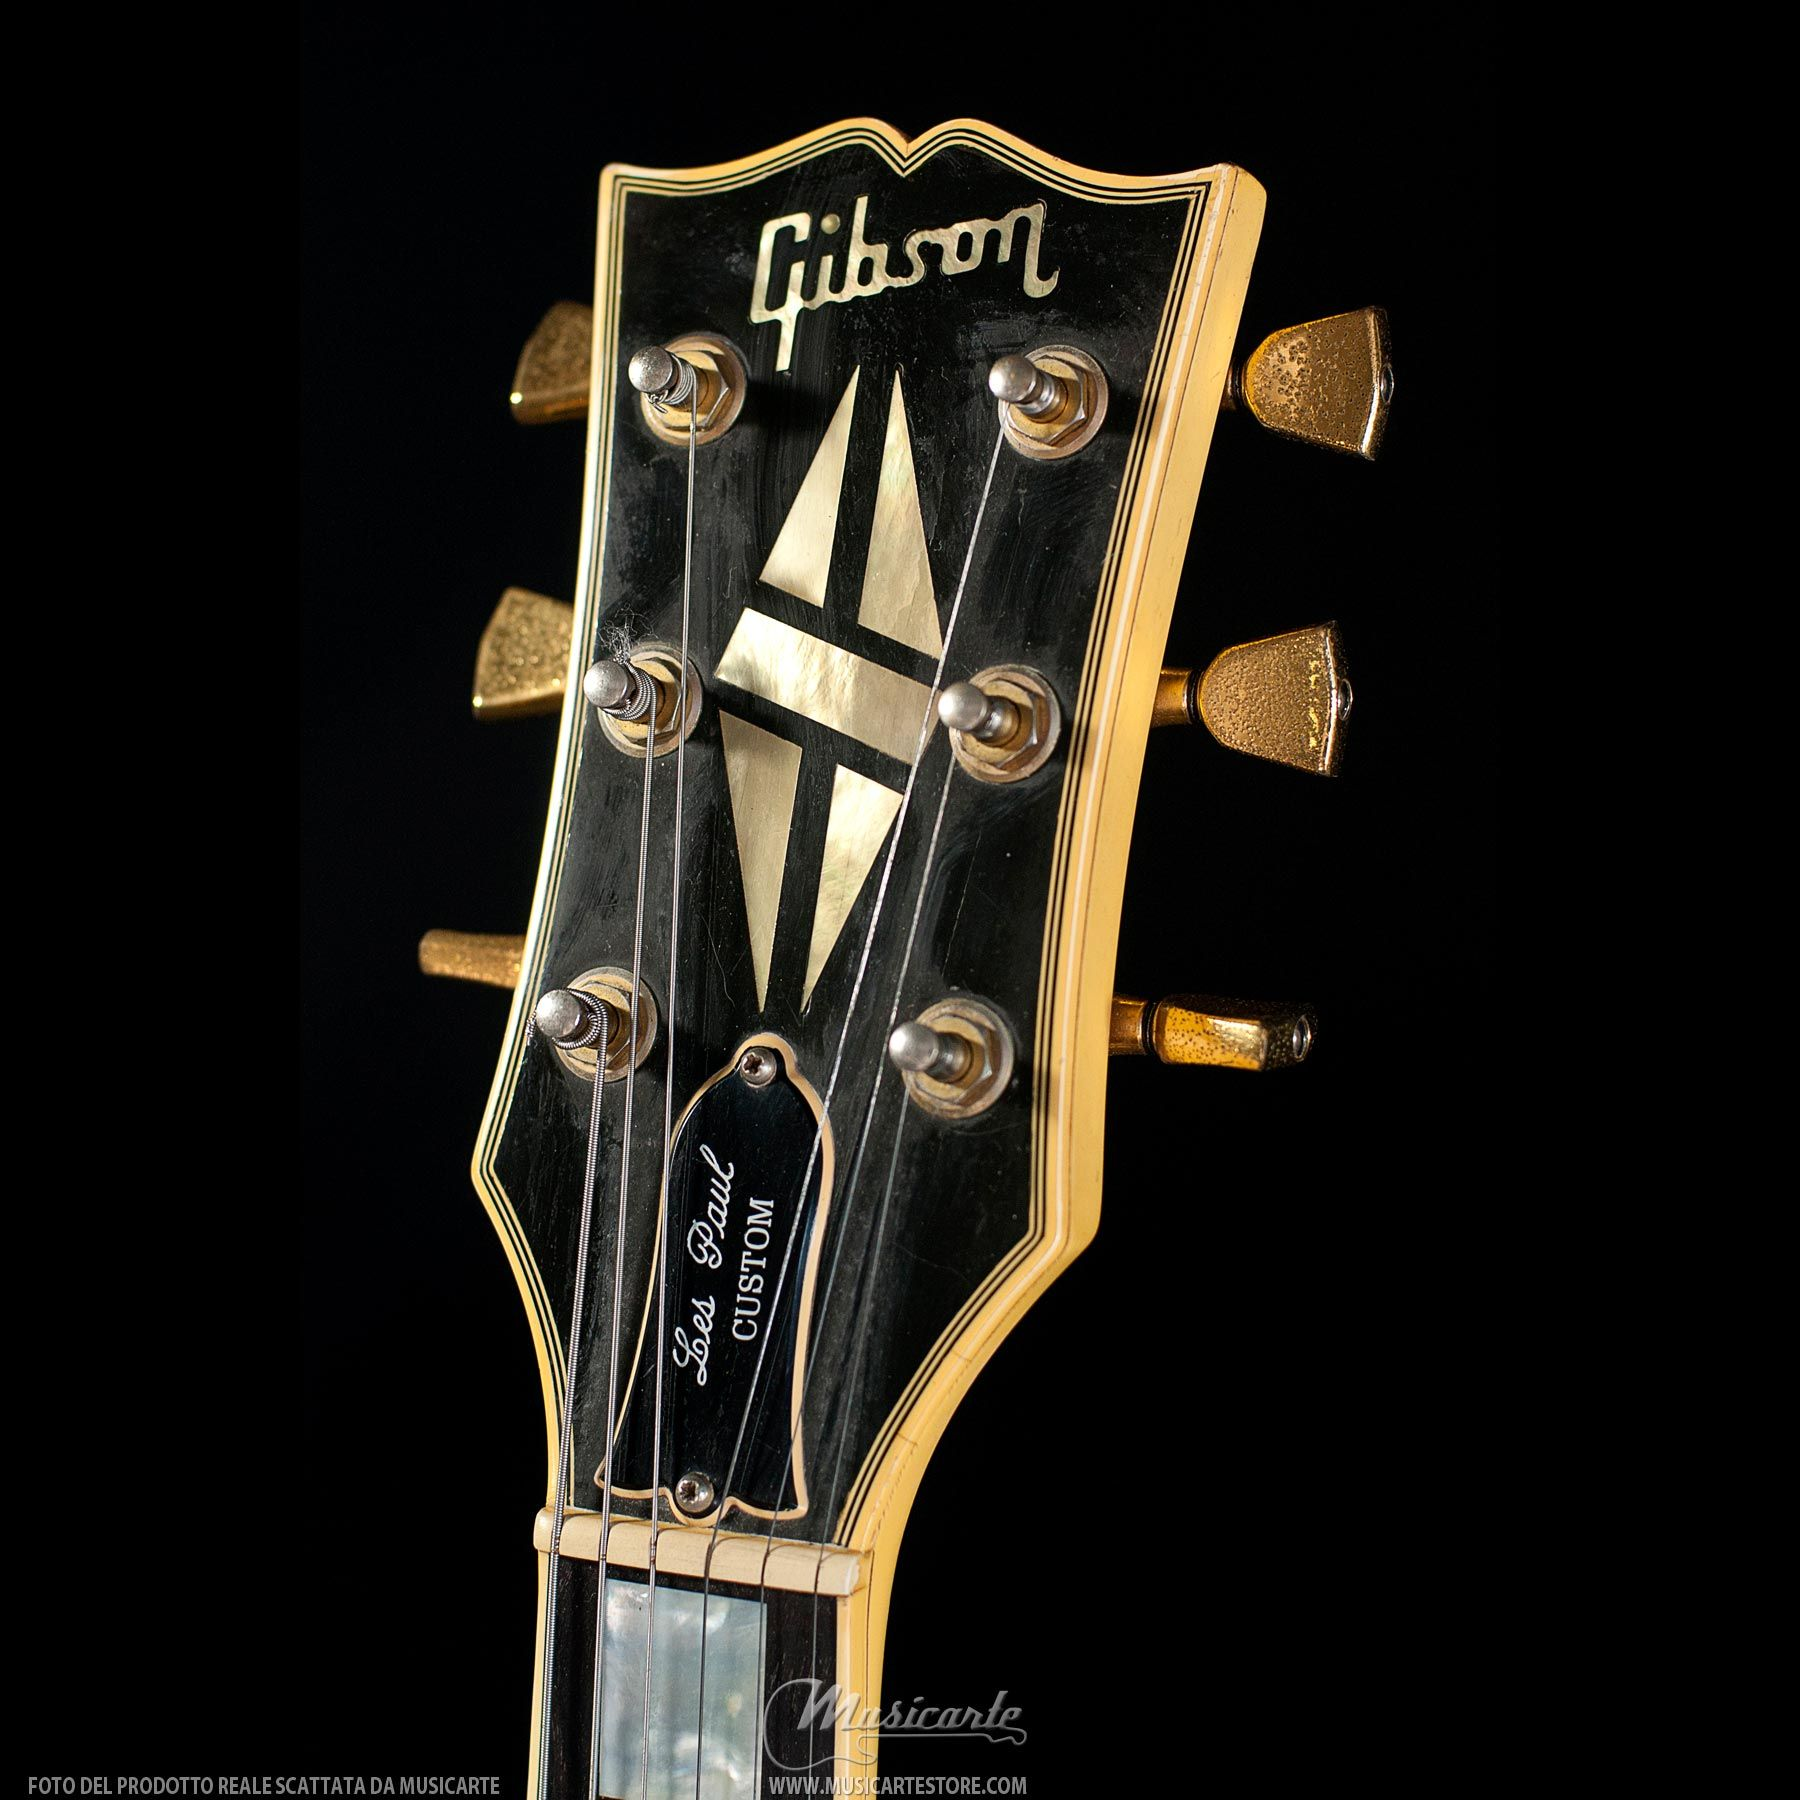 Gibson Les Paul Custom Guitar Headstock Headstocks 1981 Wiring Harness Alpine White Guitars